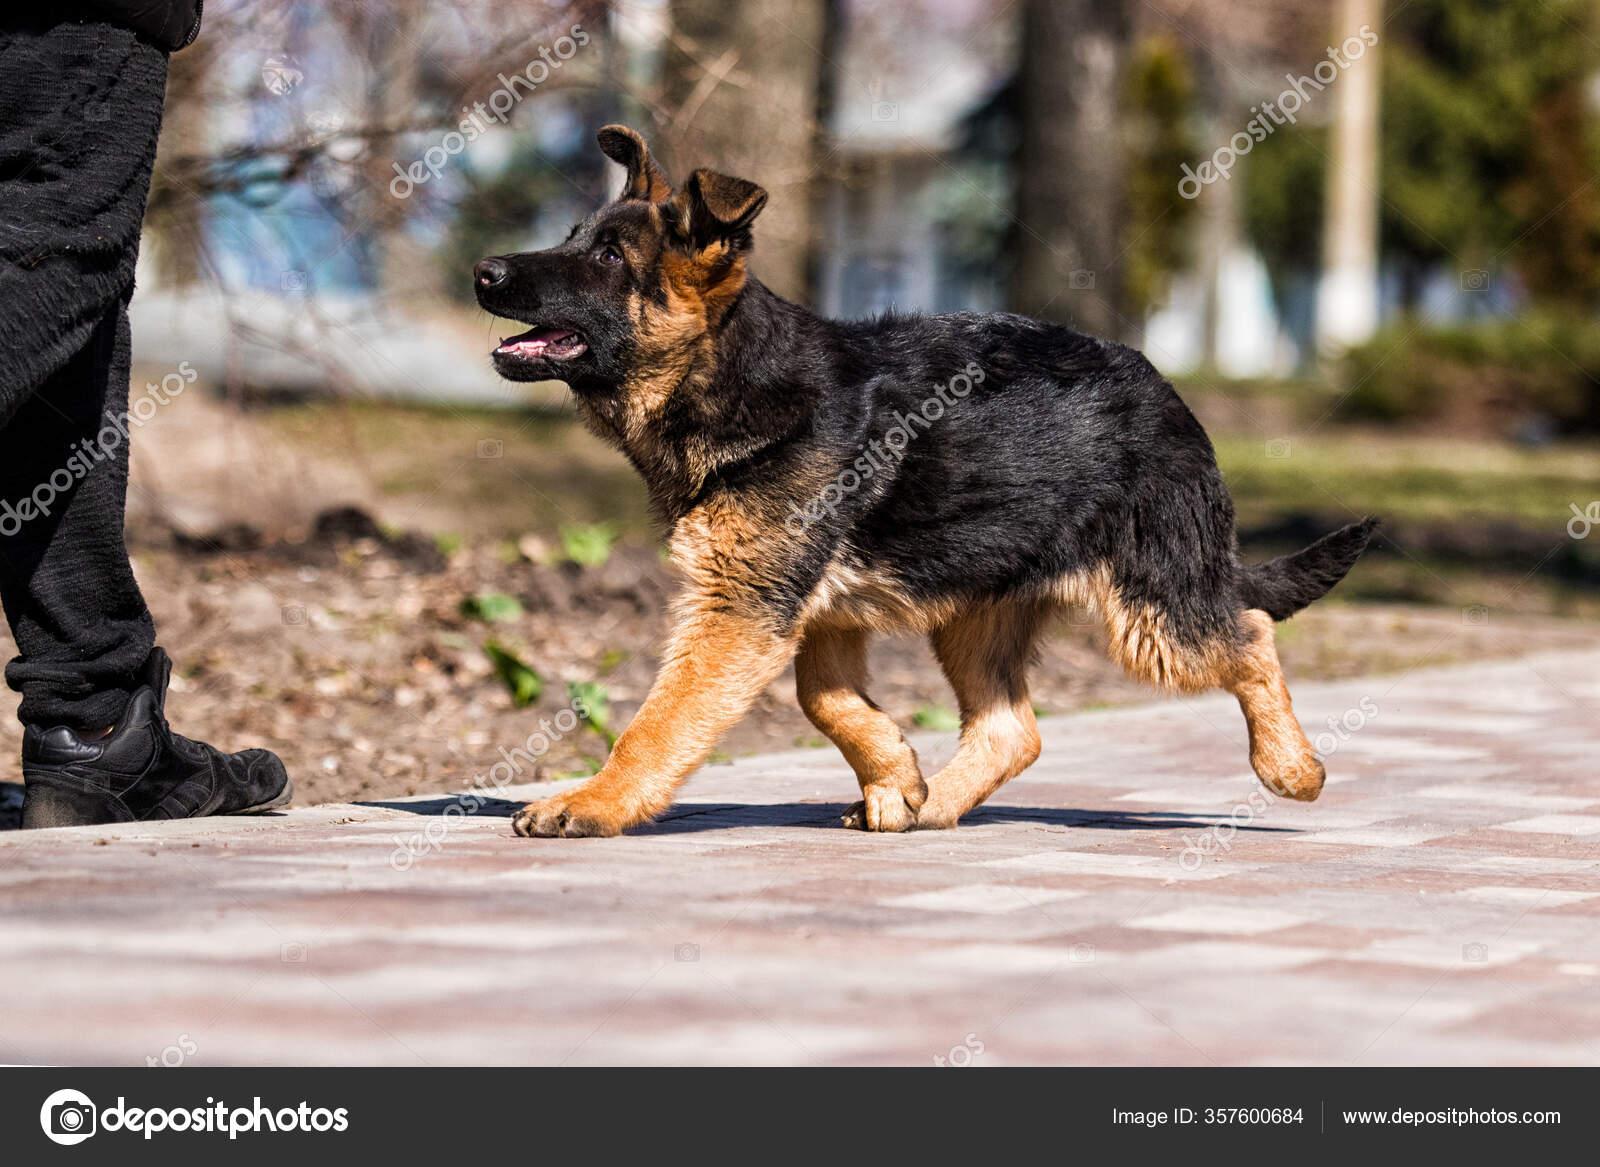 German Shepherd Puppy Training Dog Trainer Instructor Stock Photo C Gurinaleksandr 357600684